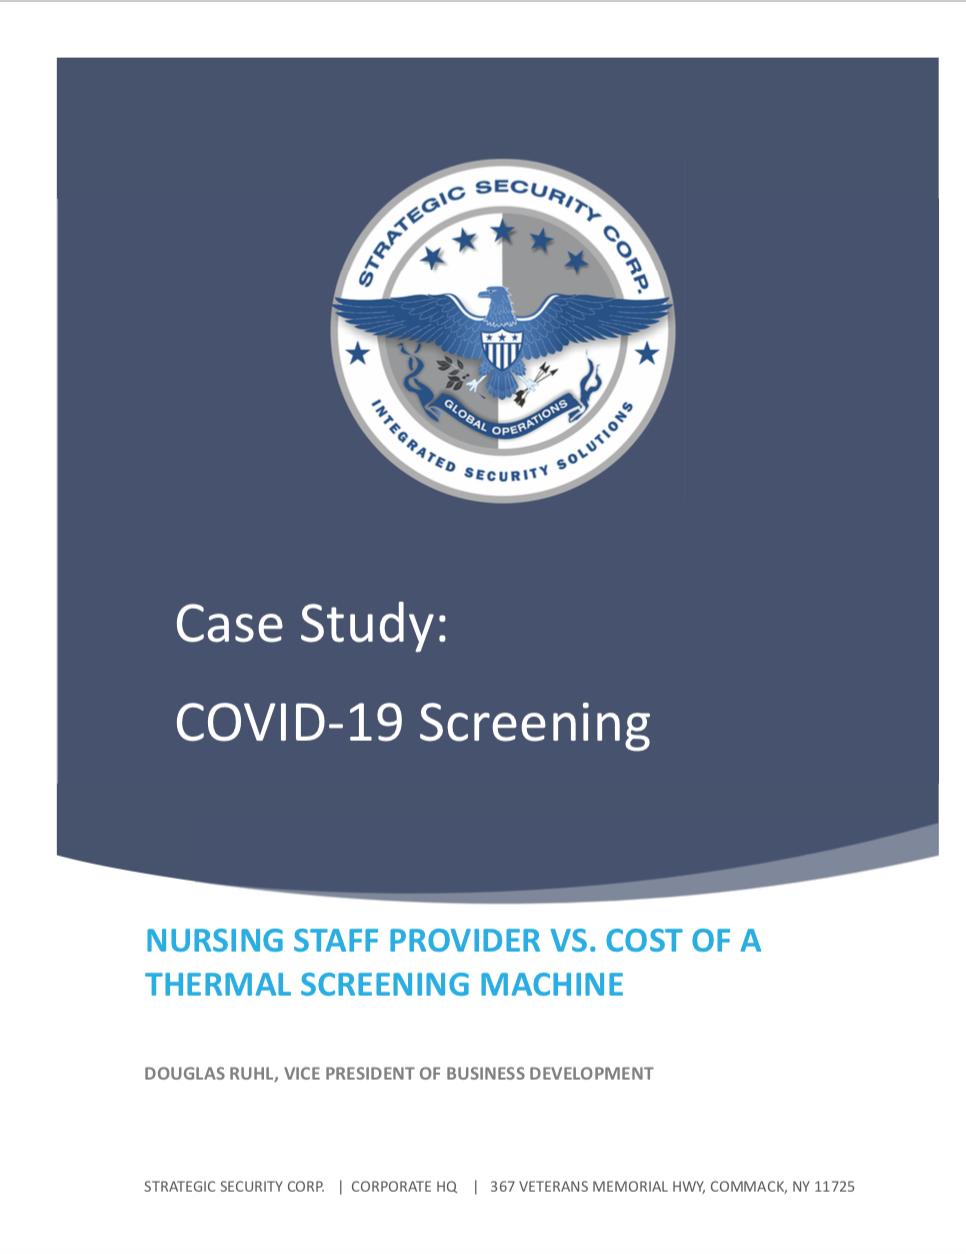 Case Study - Thermal Screening